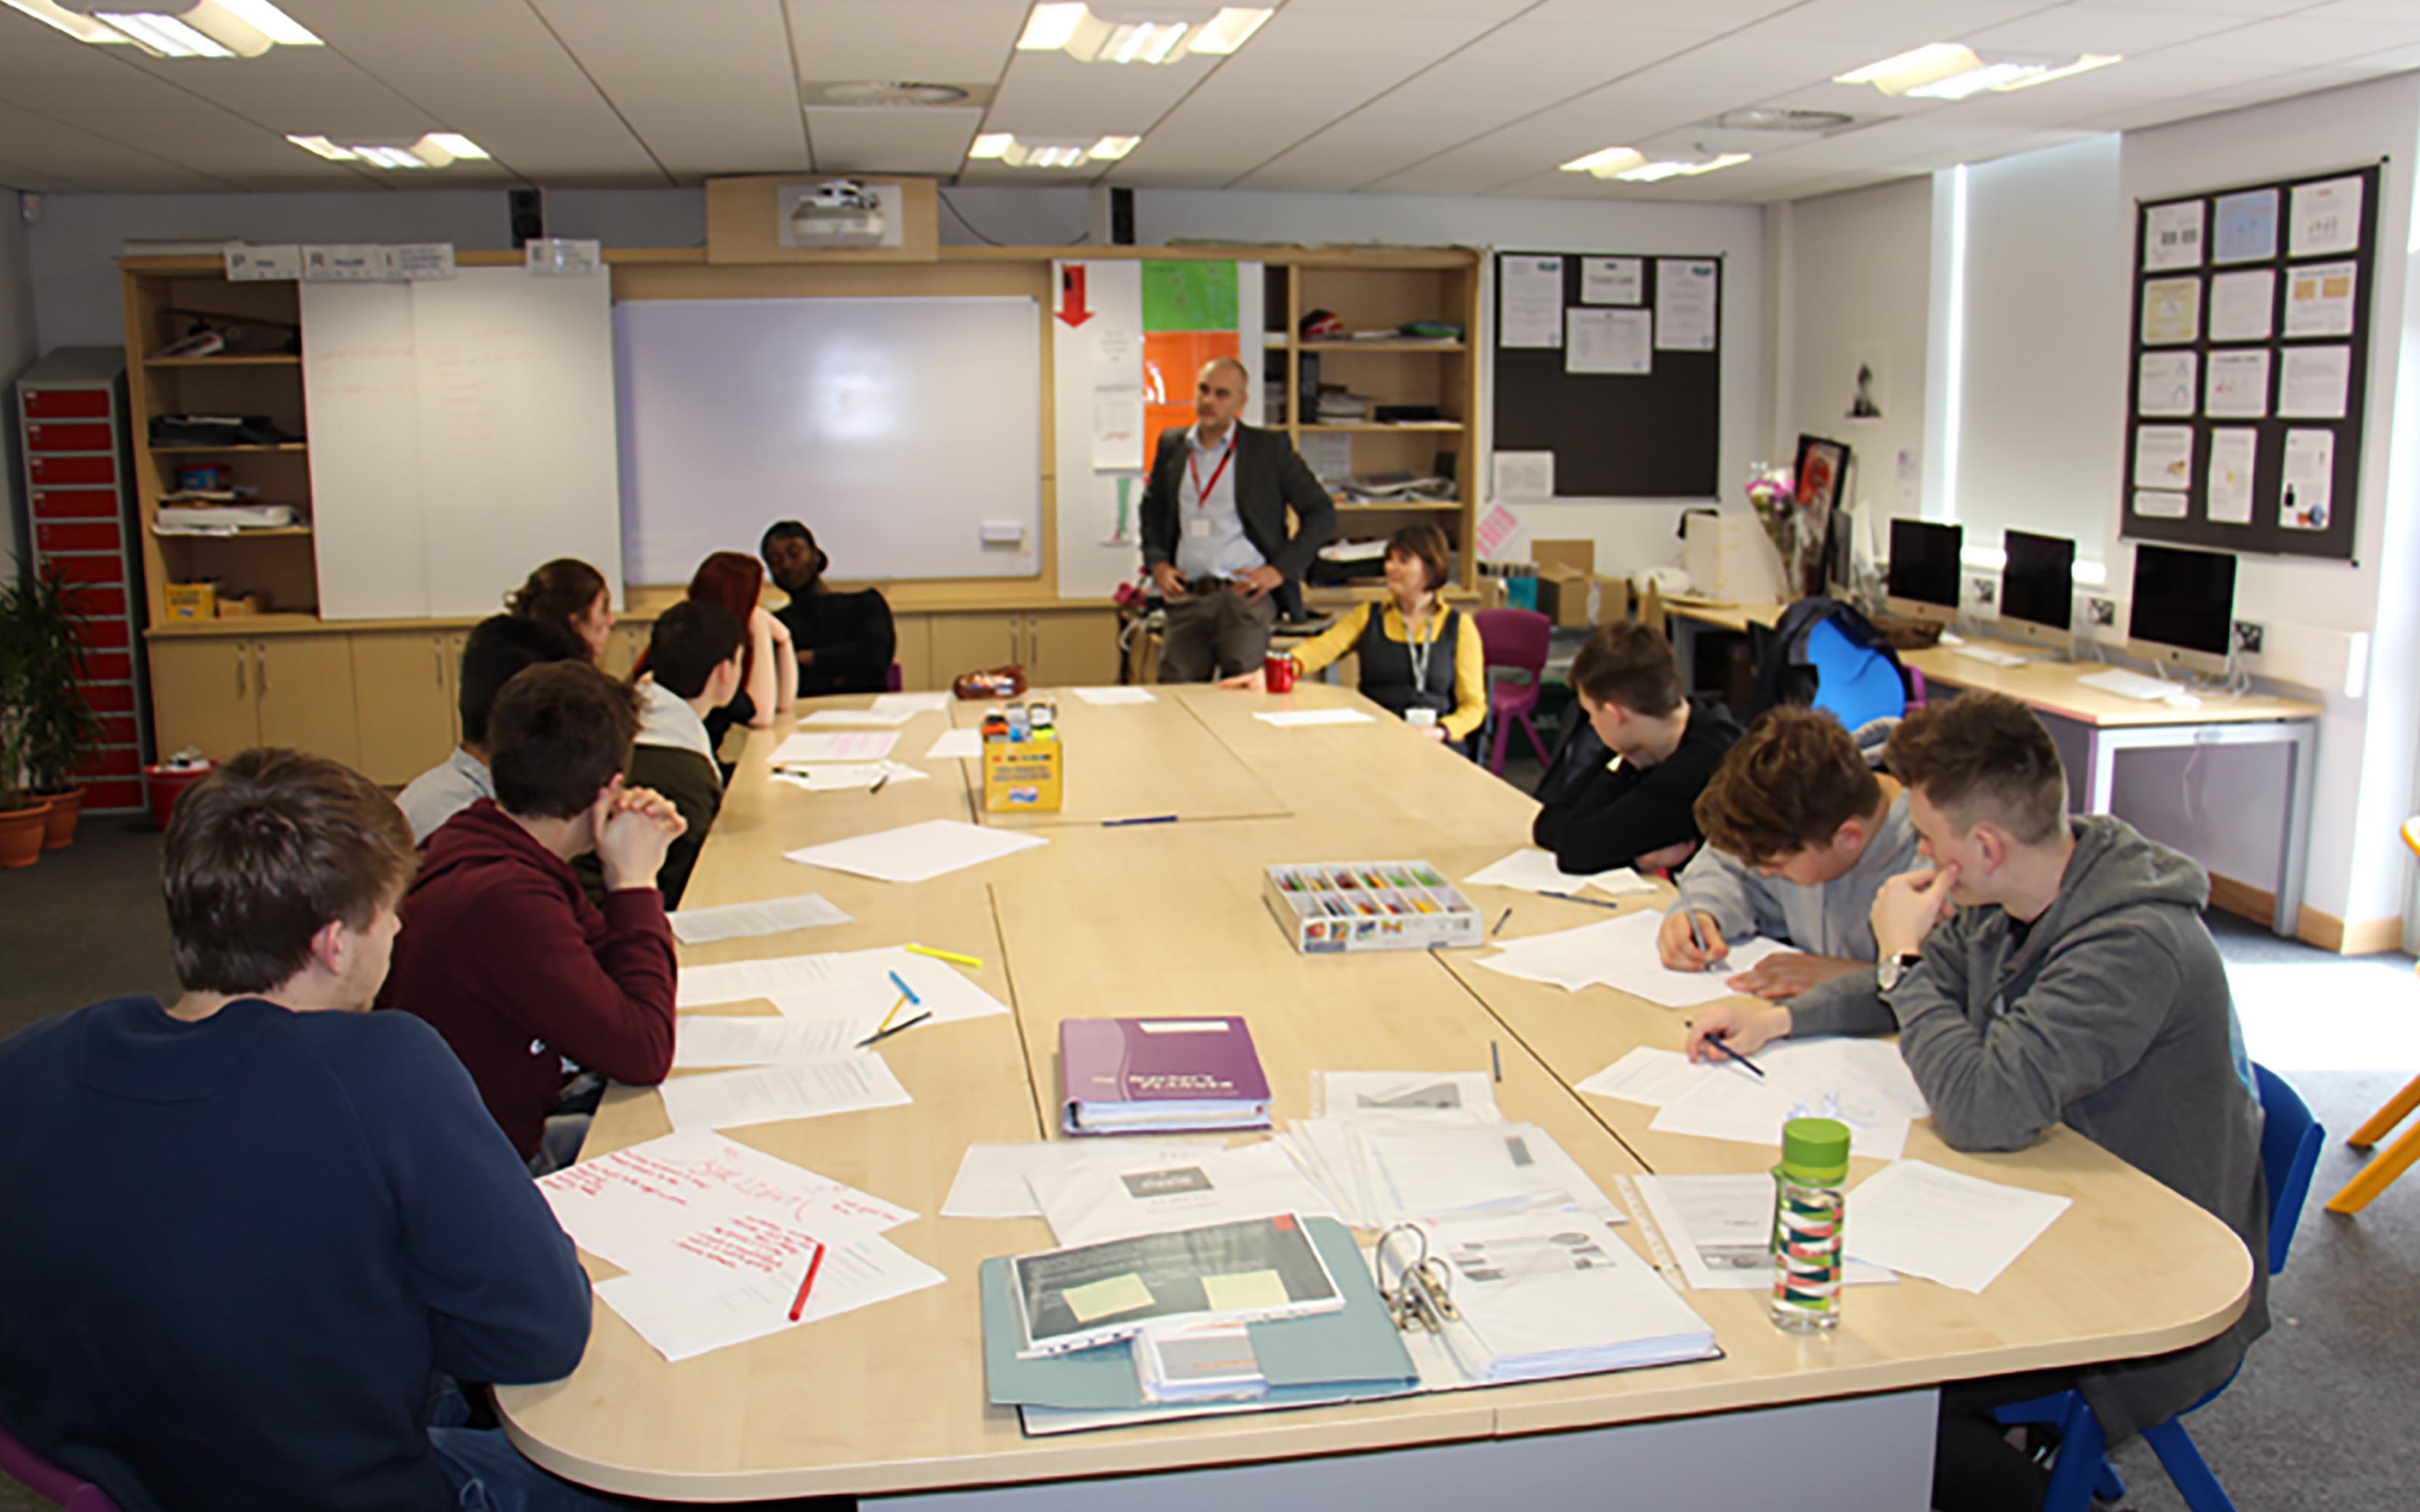 knutsford-academy-the-agency-creative